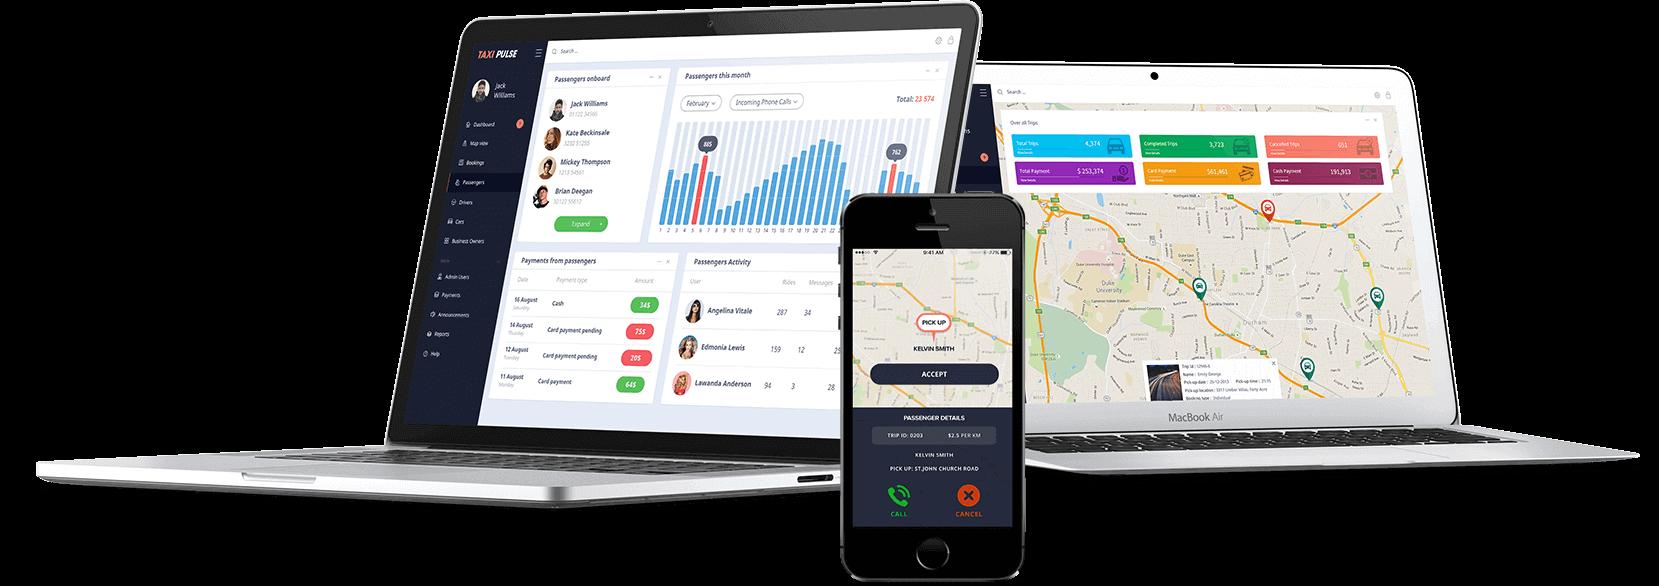 taxi pooling app custom web development mobisoft infotech